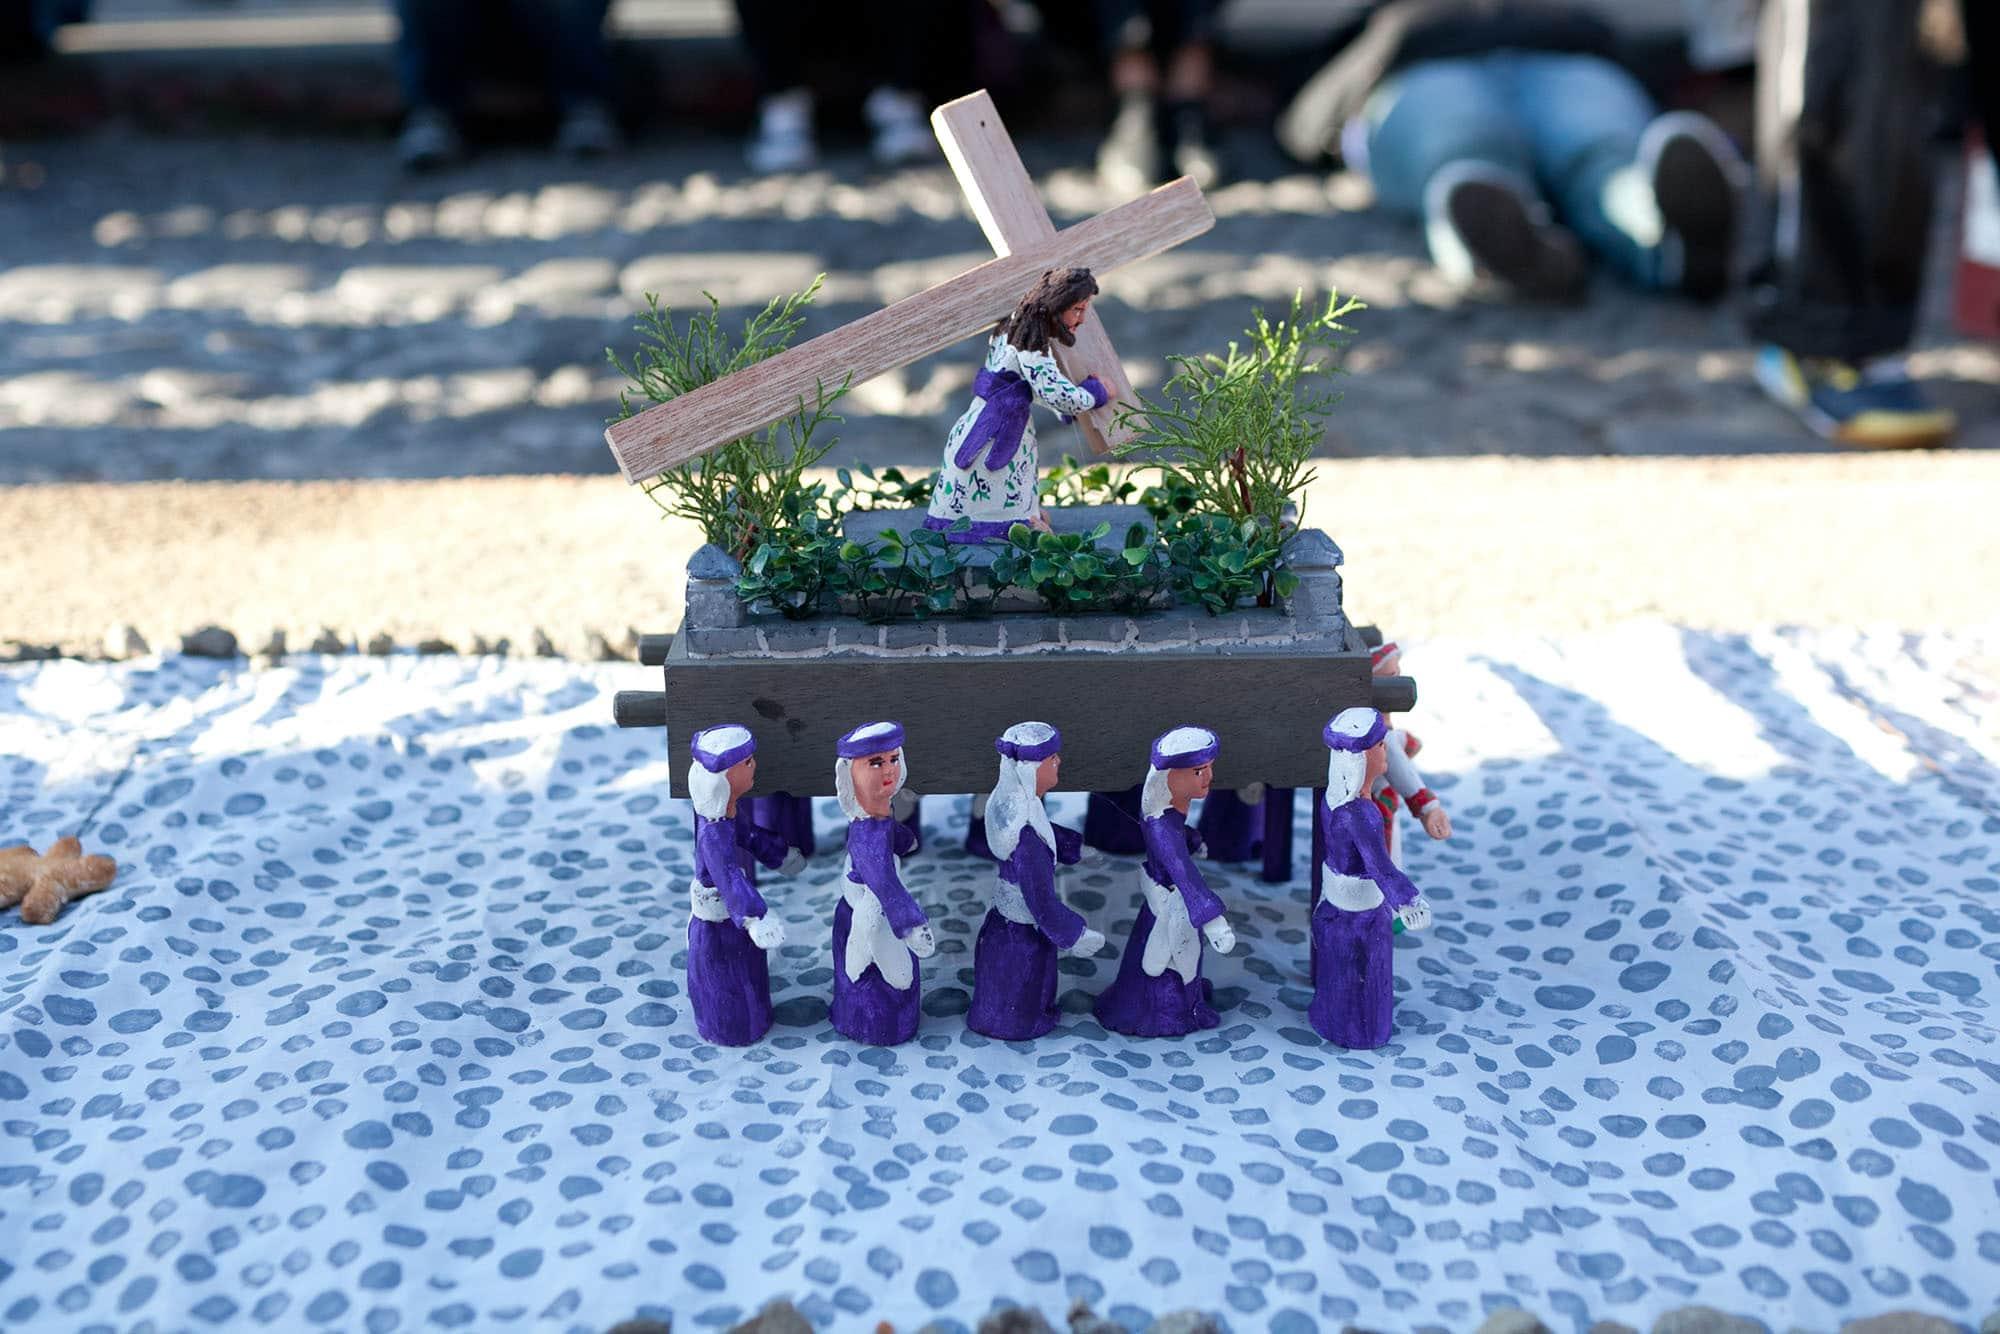 Alfombras de Semana Santa  - Holy Week - in Antigua, Guatemala.